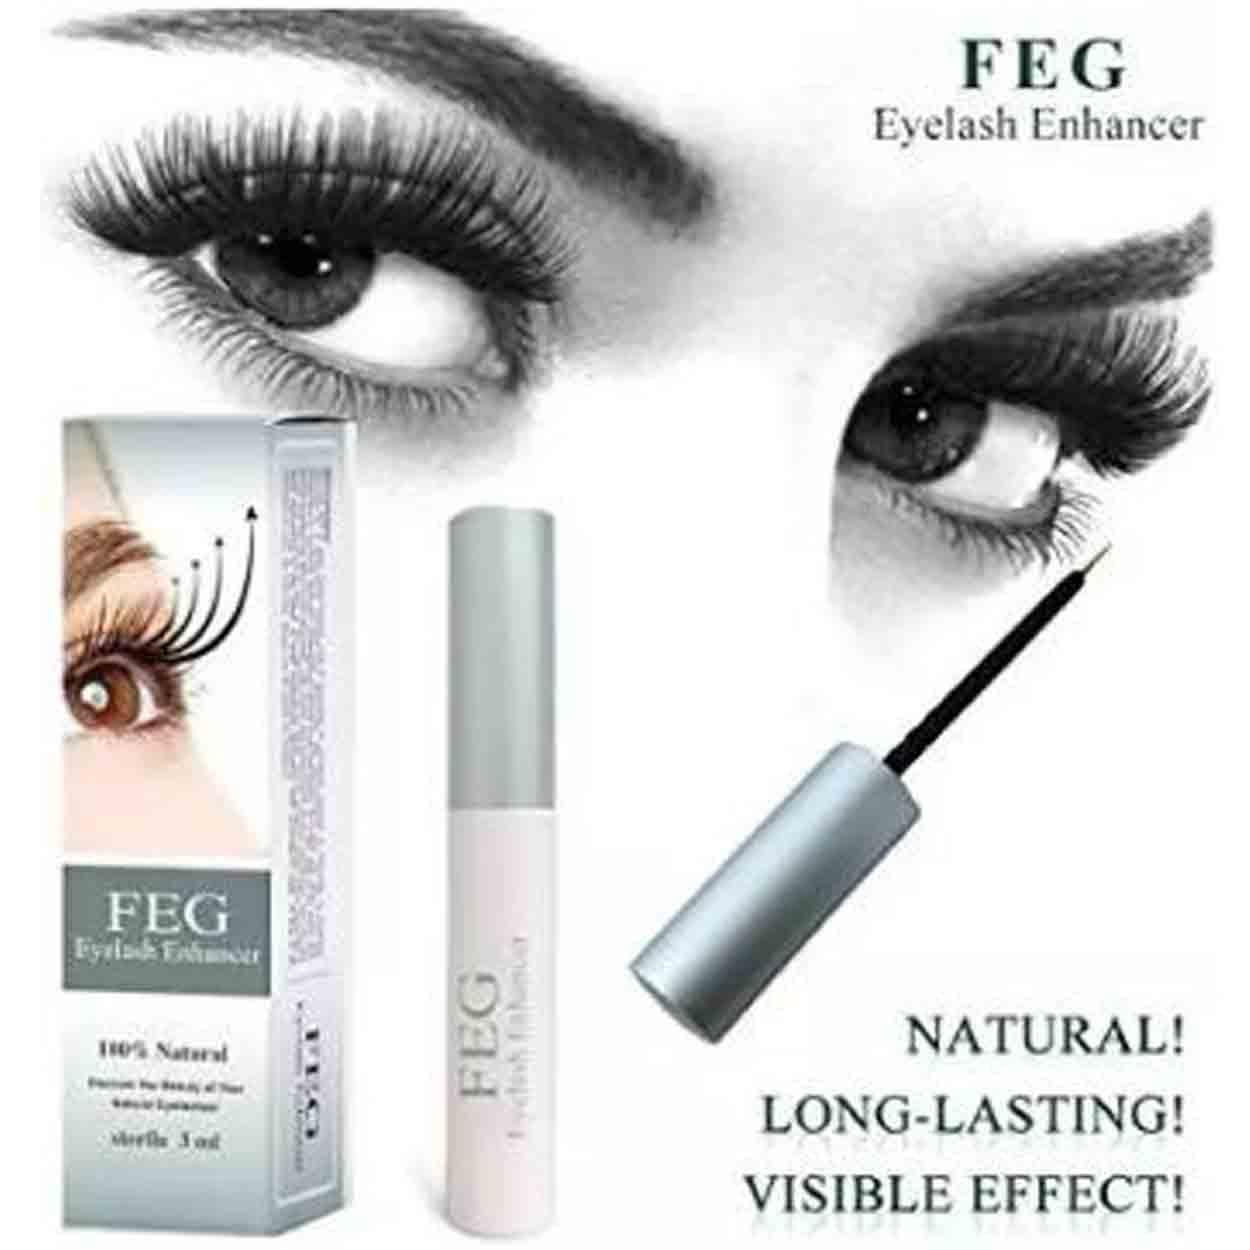 FEG Eyelash Enhancer Eye Lash Rapid Growth Serum Liquid 100% Natural 3ml (Balck) Philippines